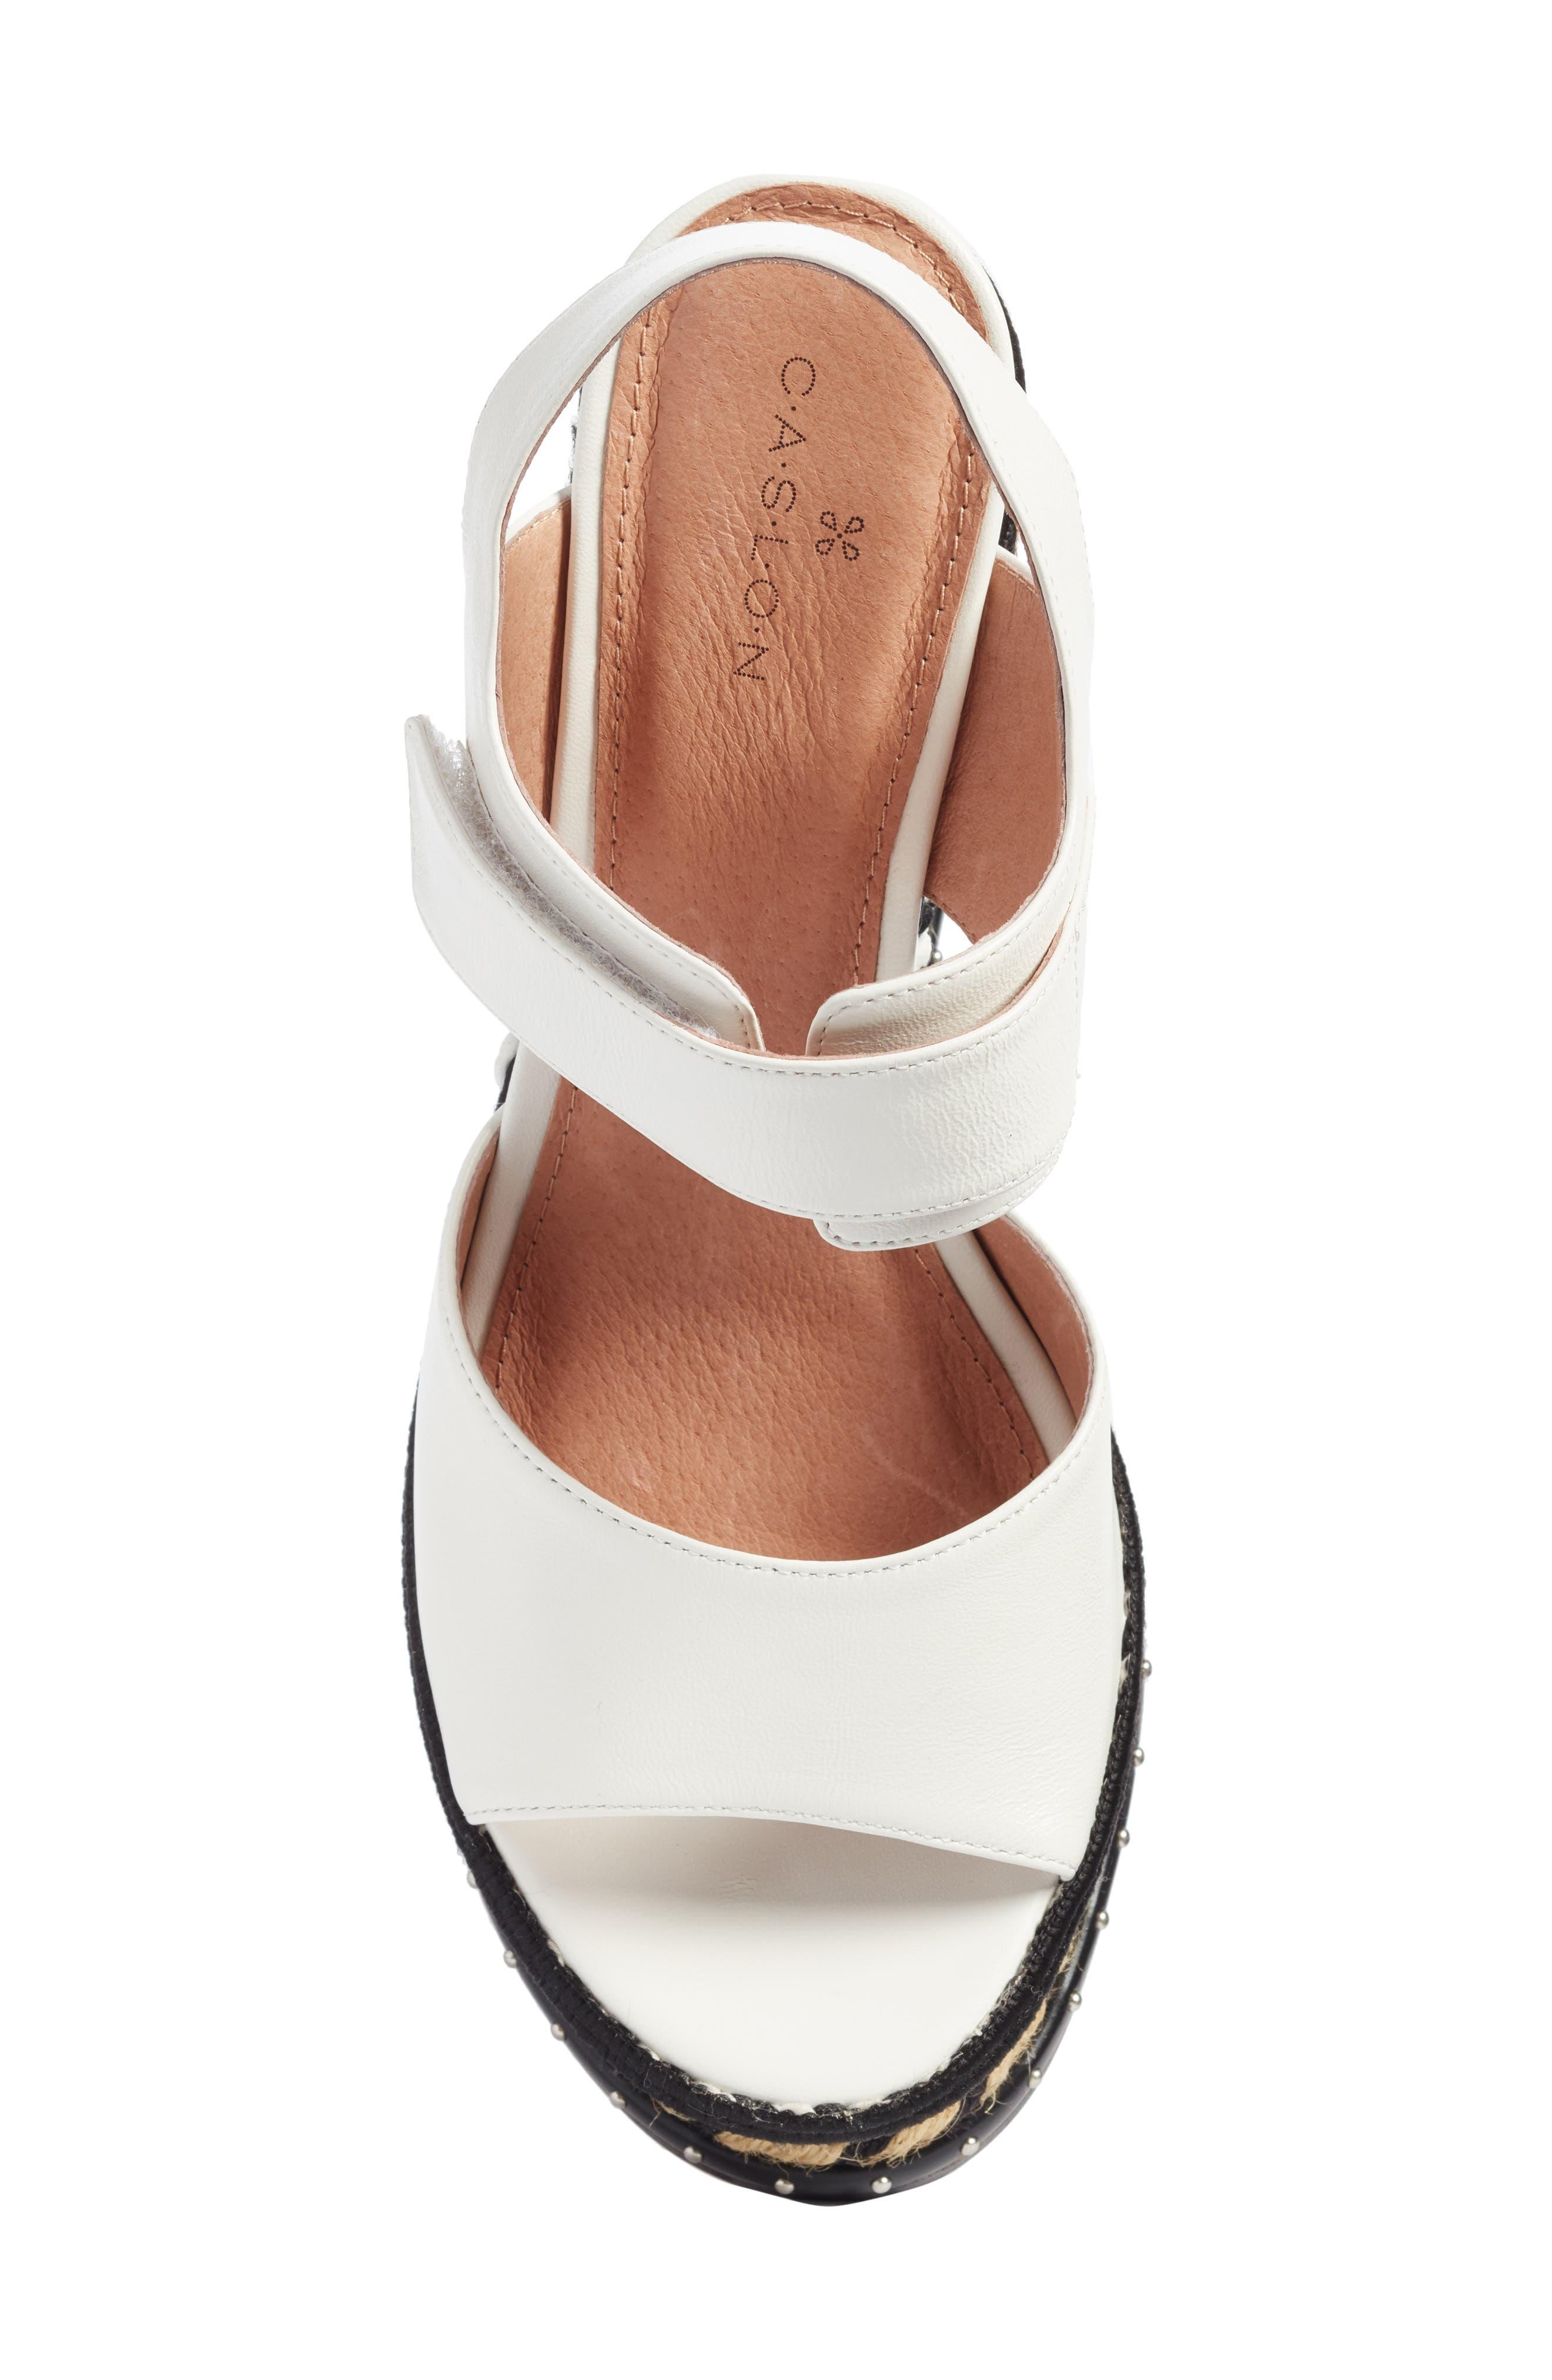 Braxton Platform Wedge Sandal,                             Alternate thumbnail 10, color,